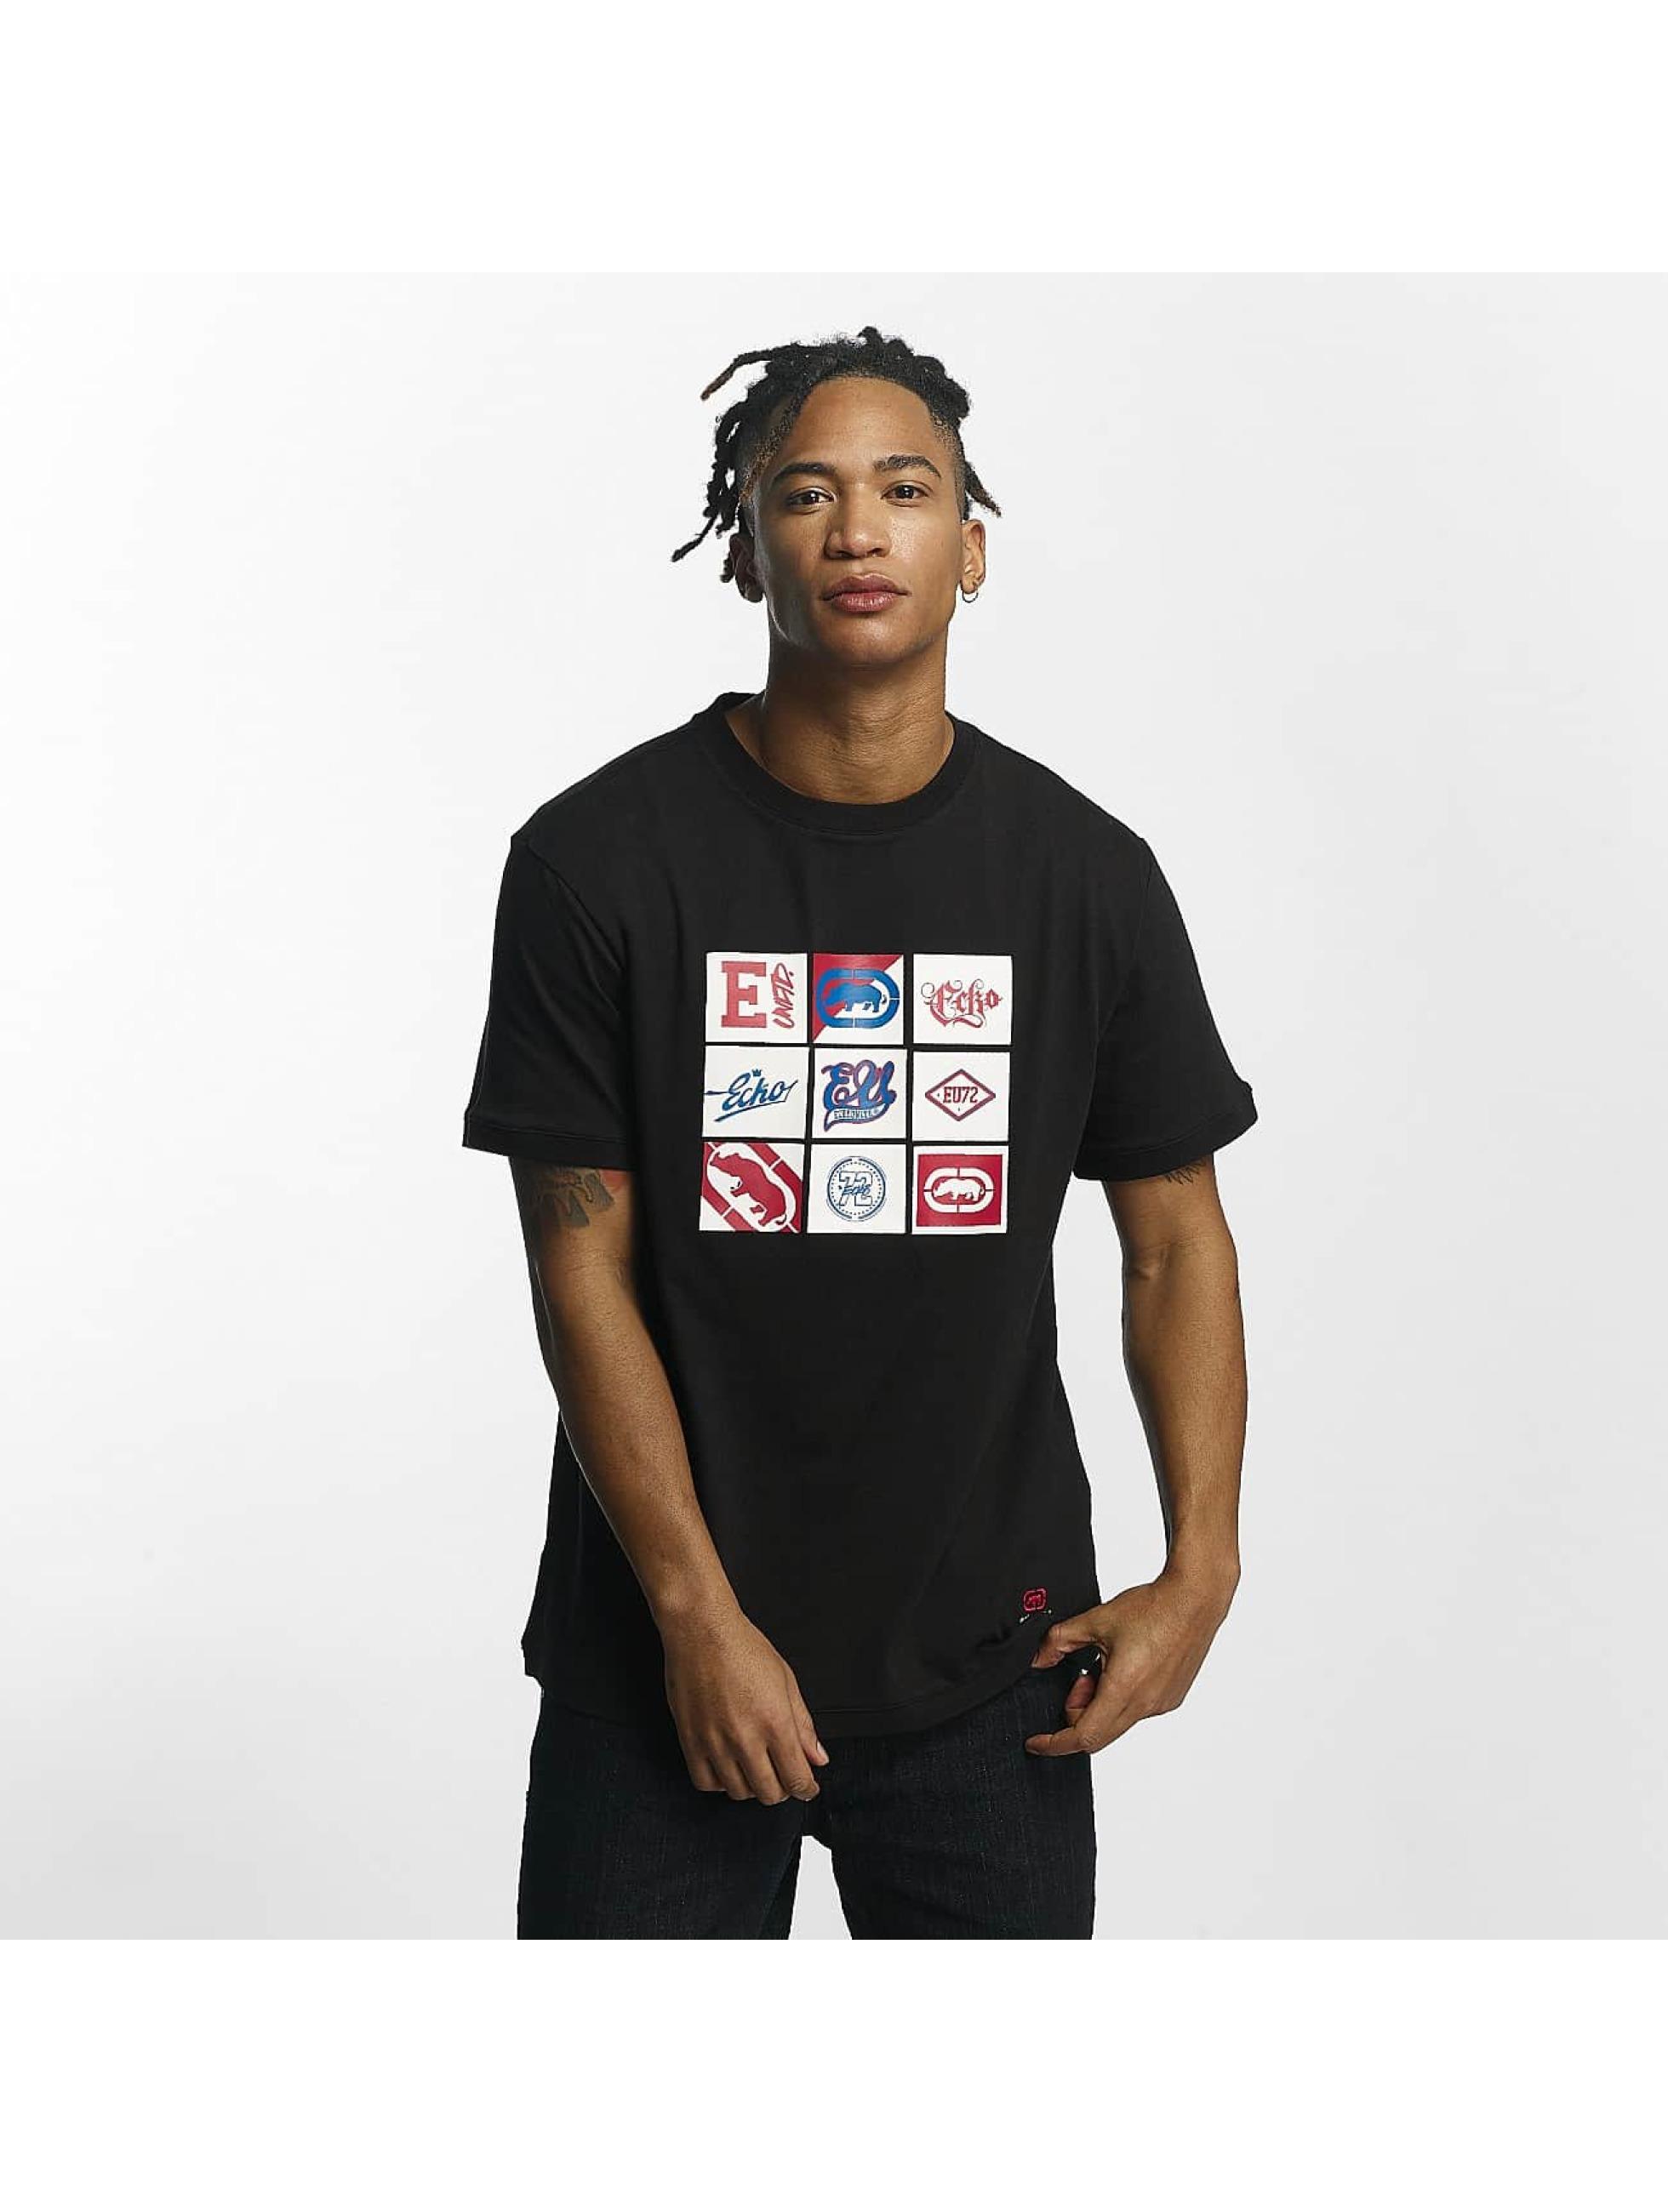 Ecko Unltd. / T-Shirt Clifton in black 4XL